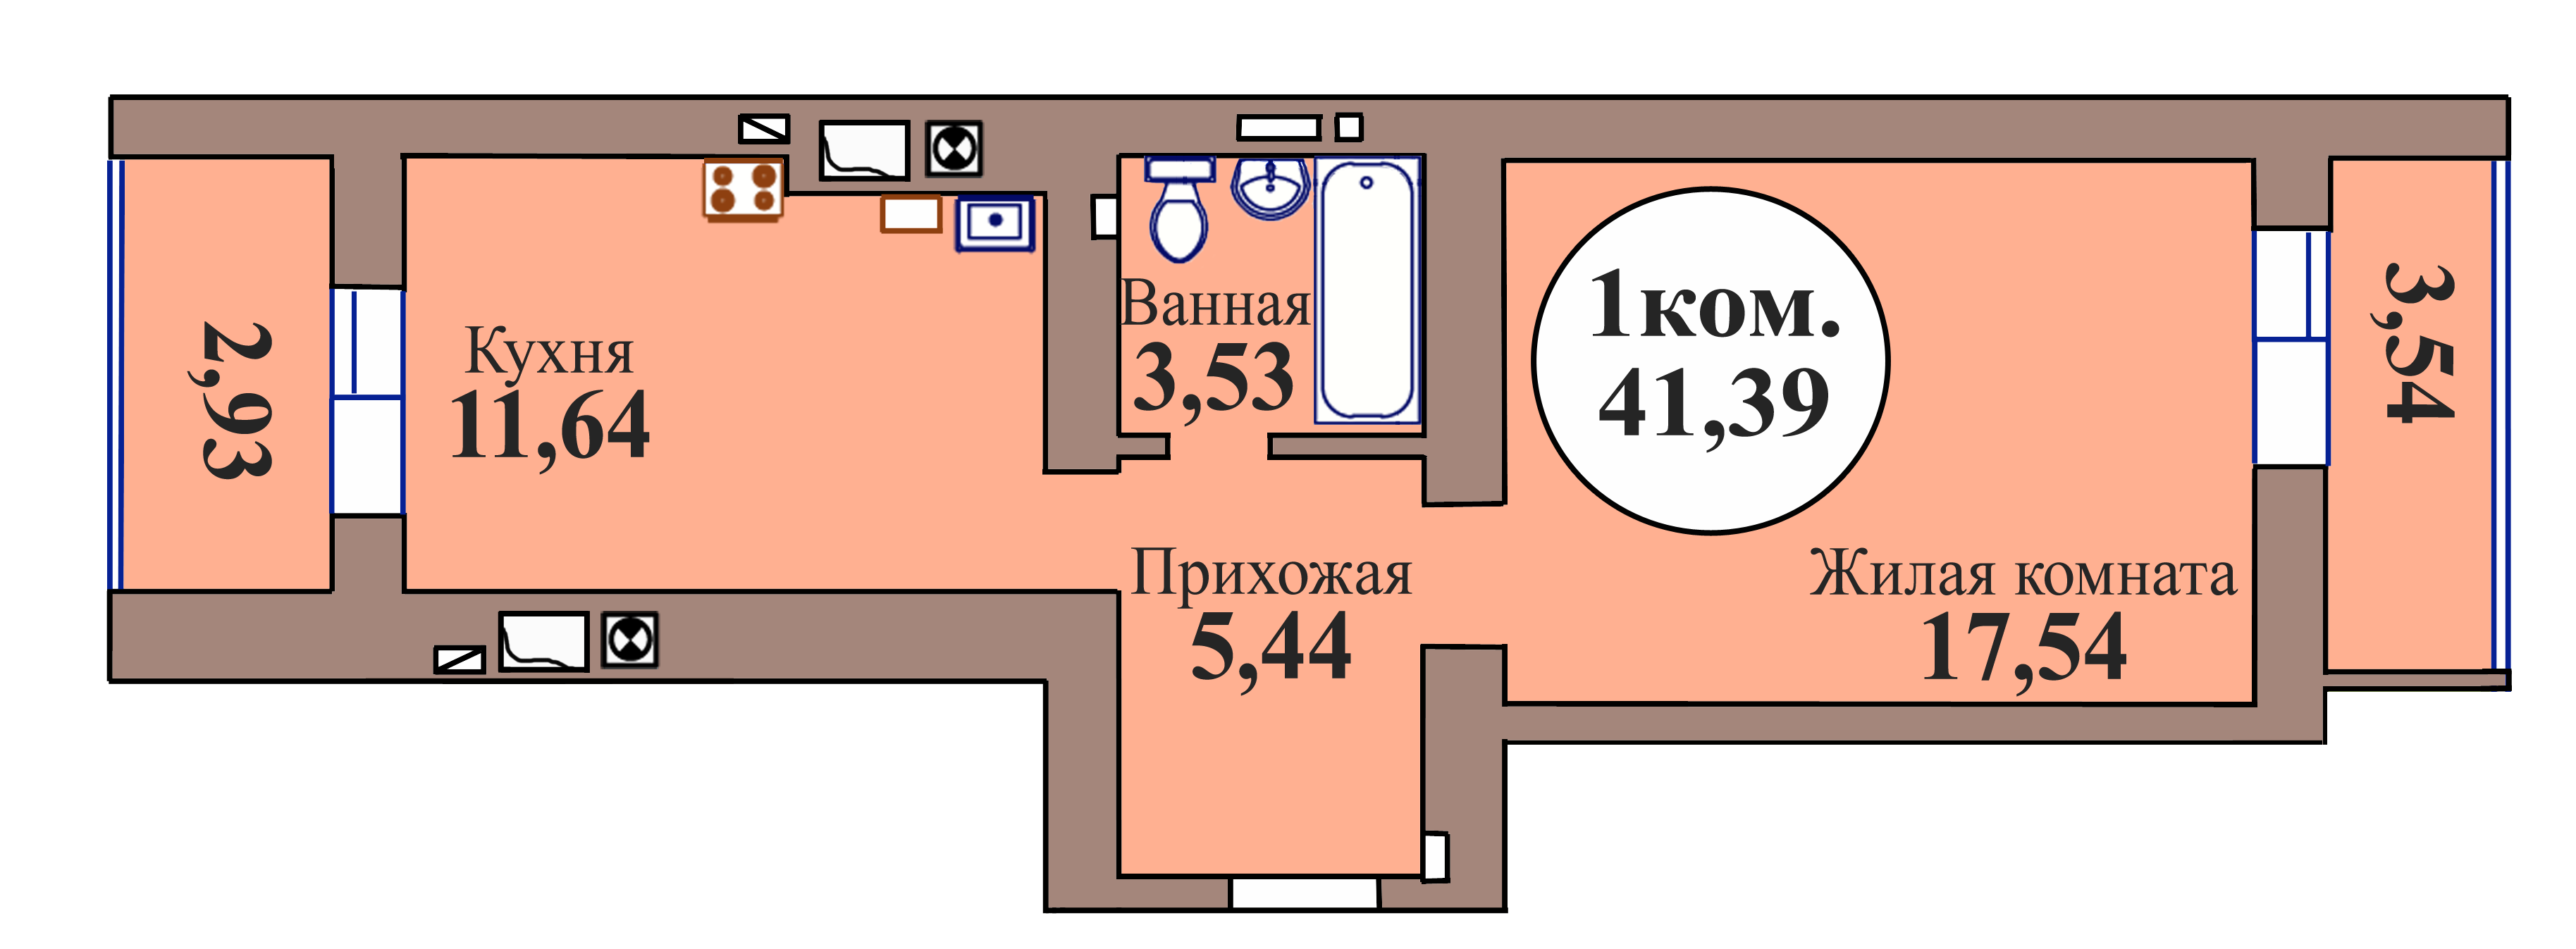 1-комн. кв. по пер. Калининградский, 5 кв. 23 в Калининграде